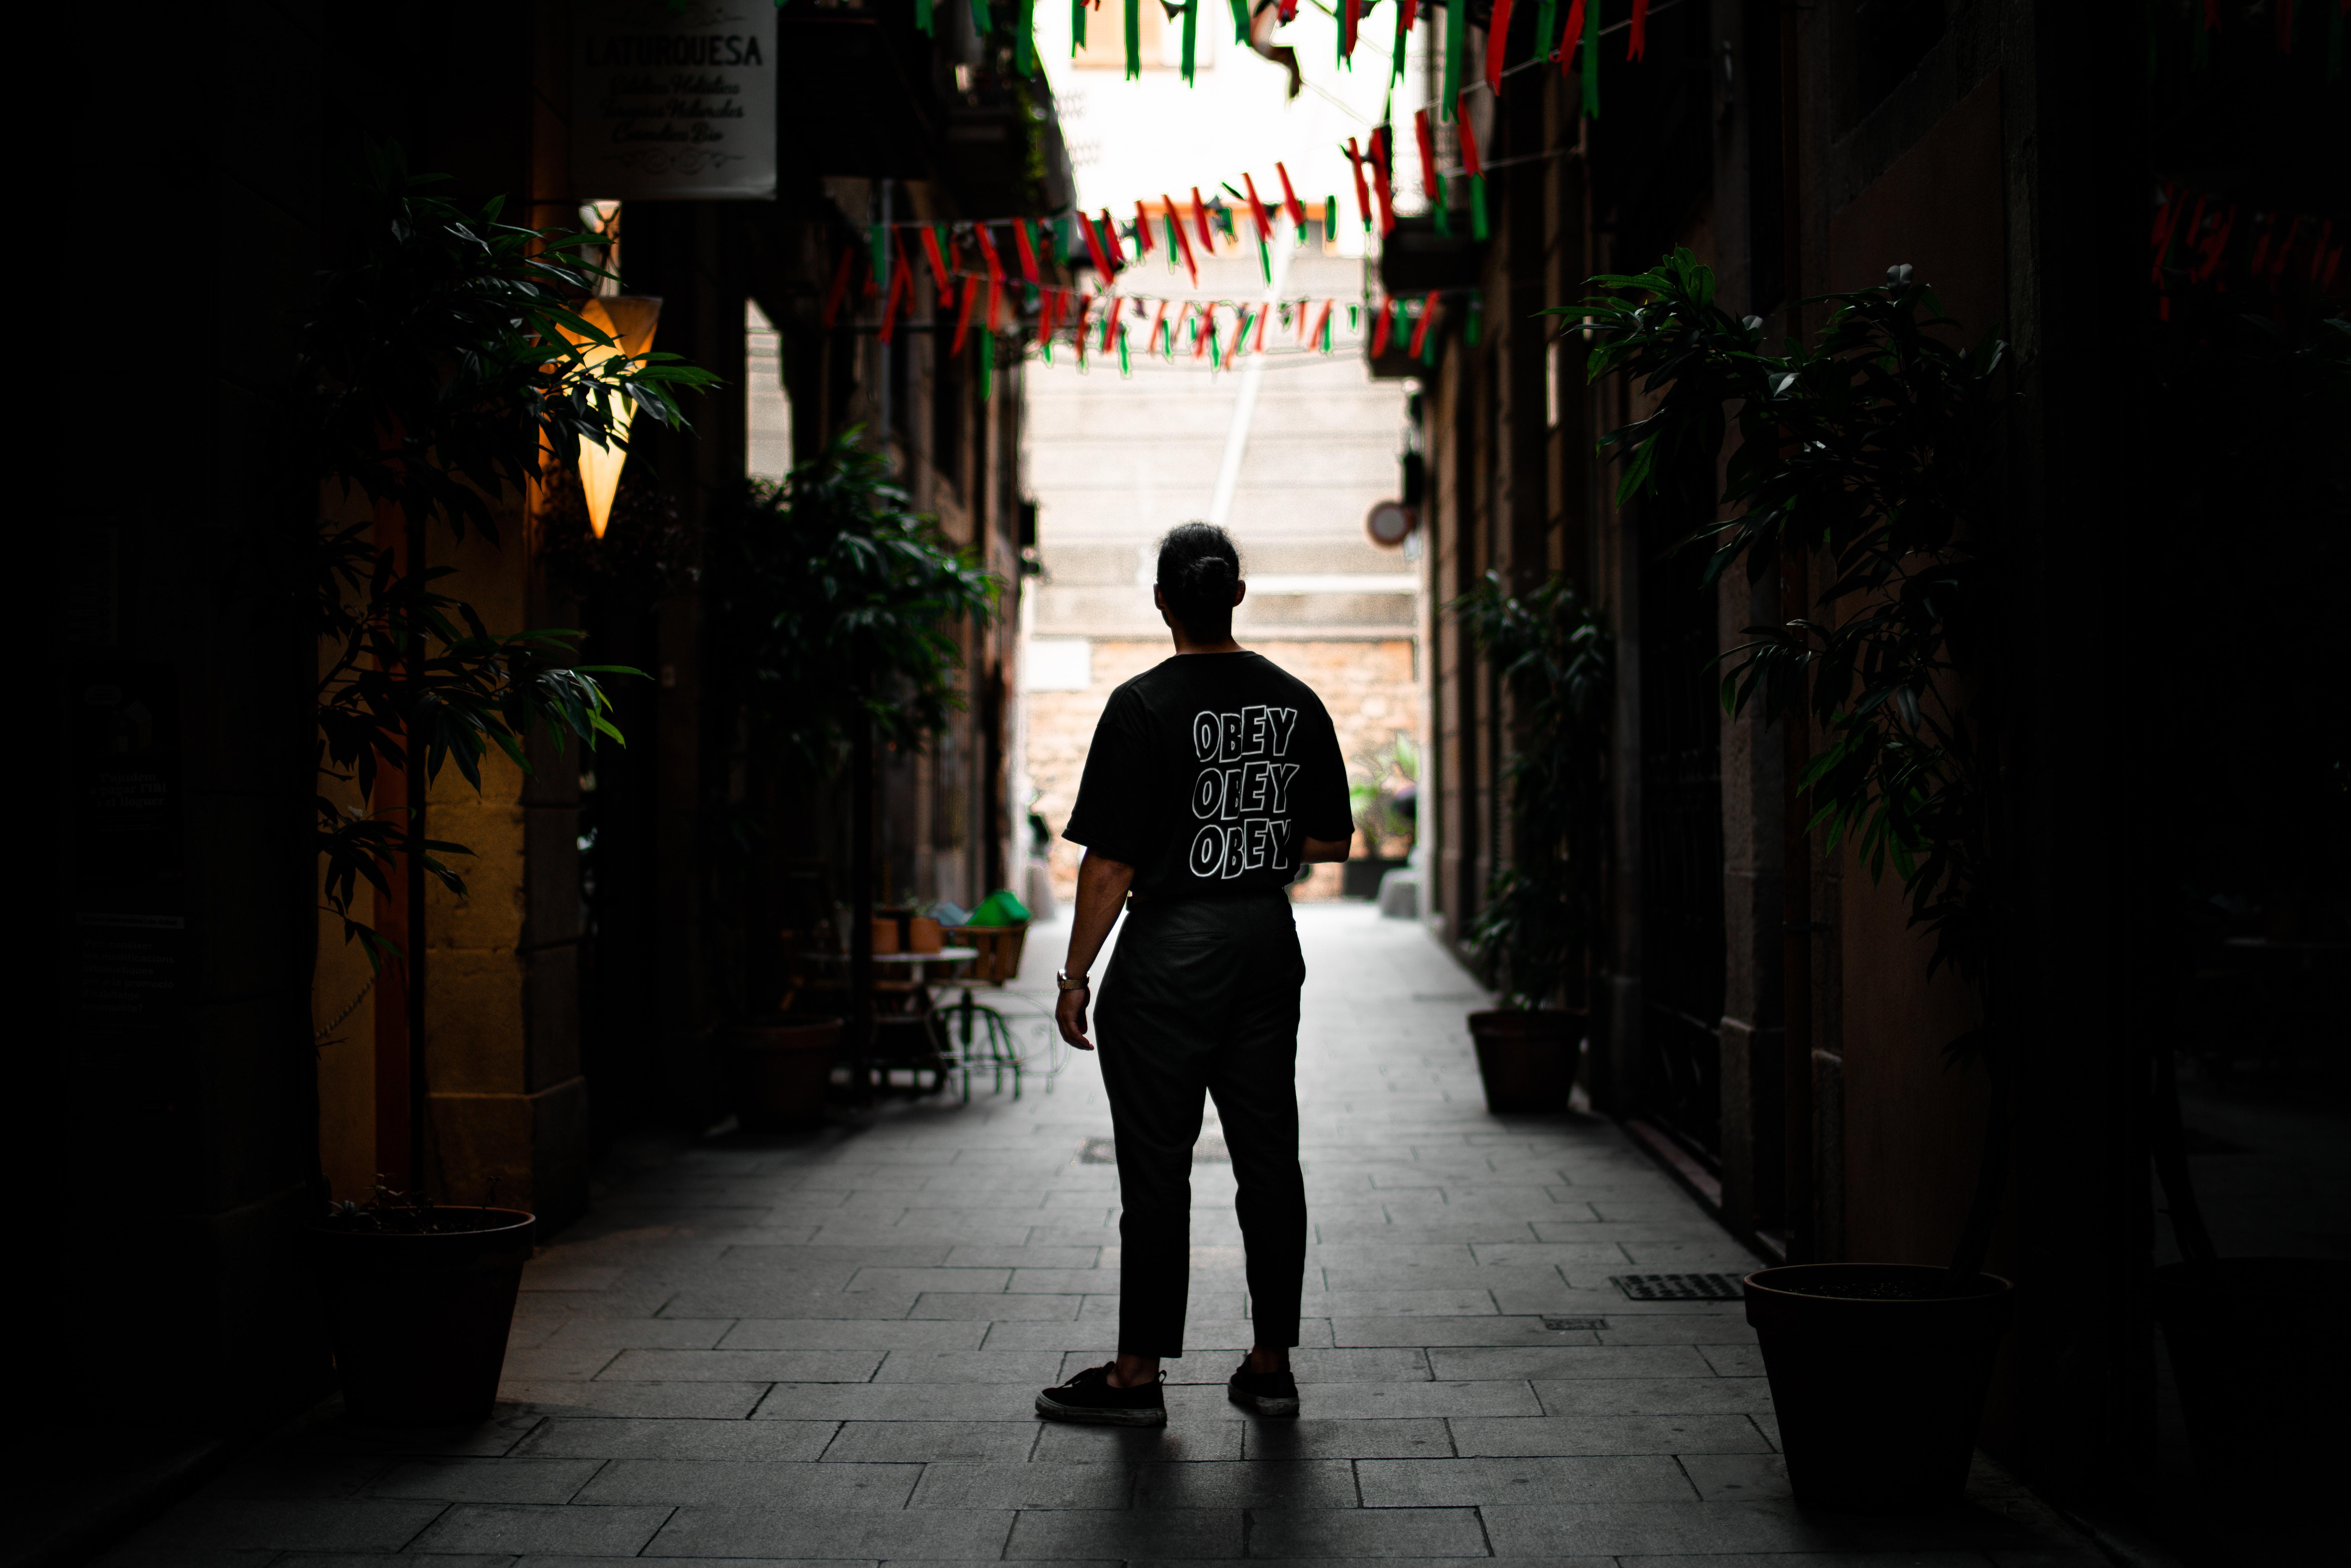 man standing in alley between buildings